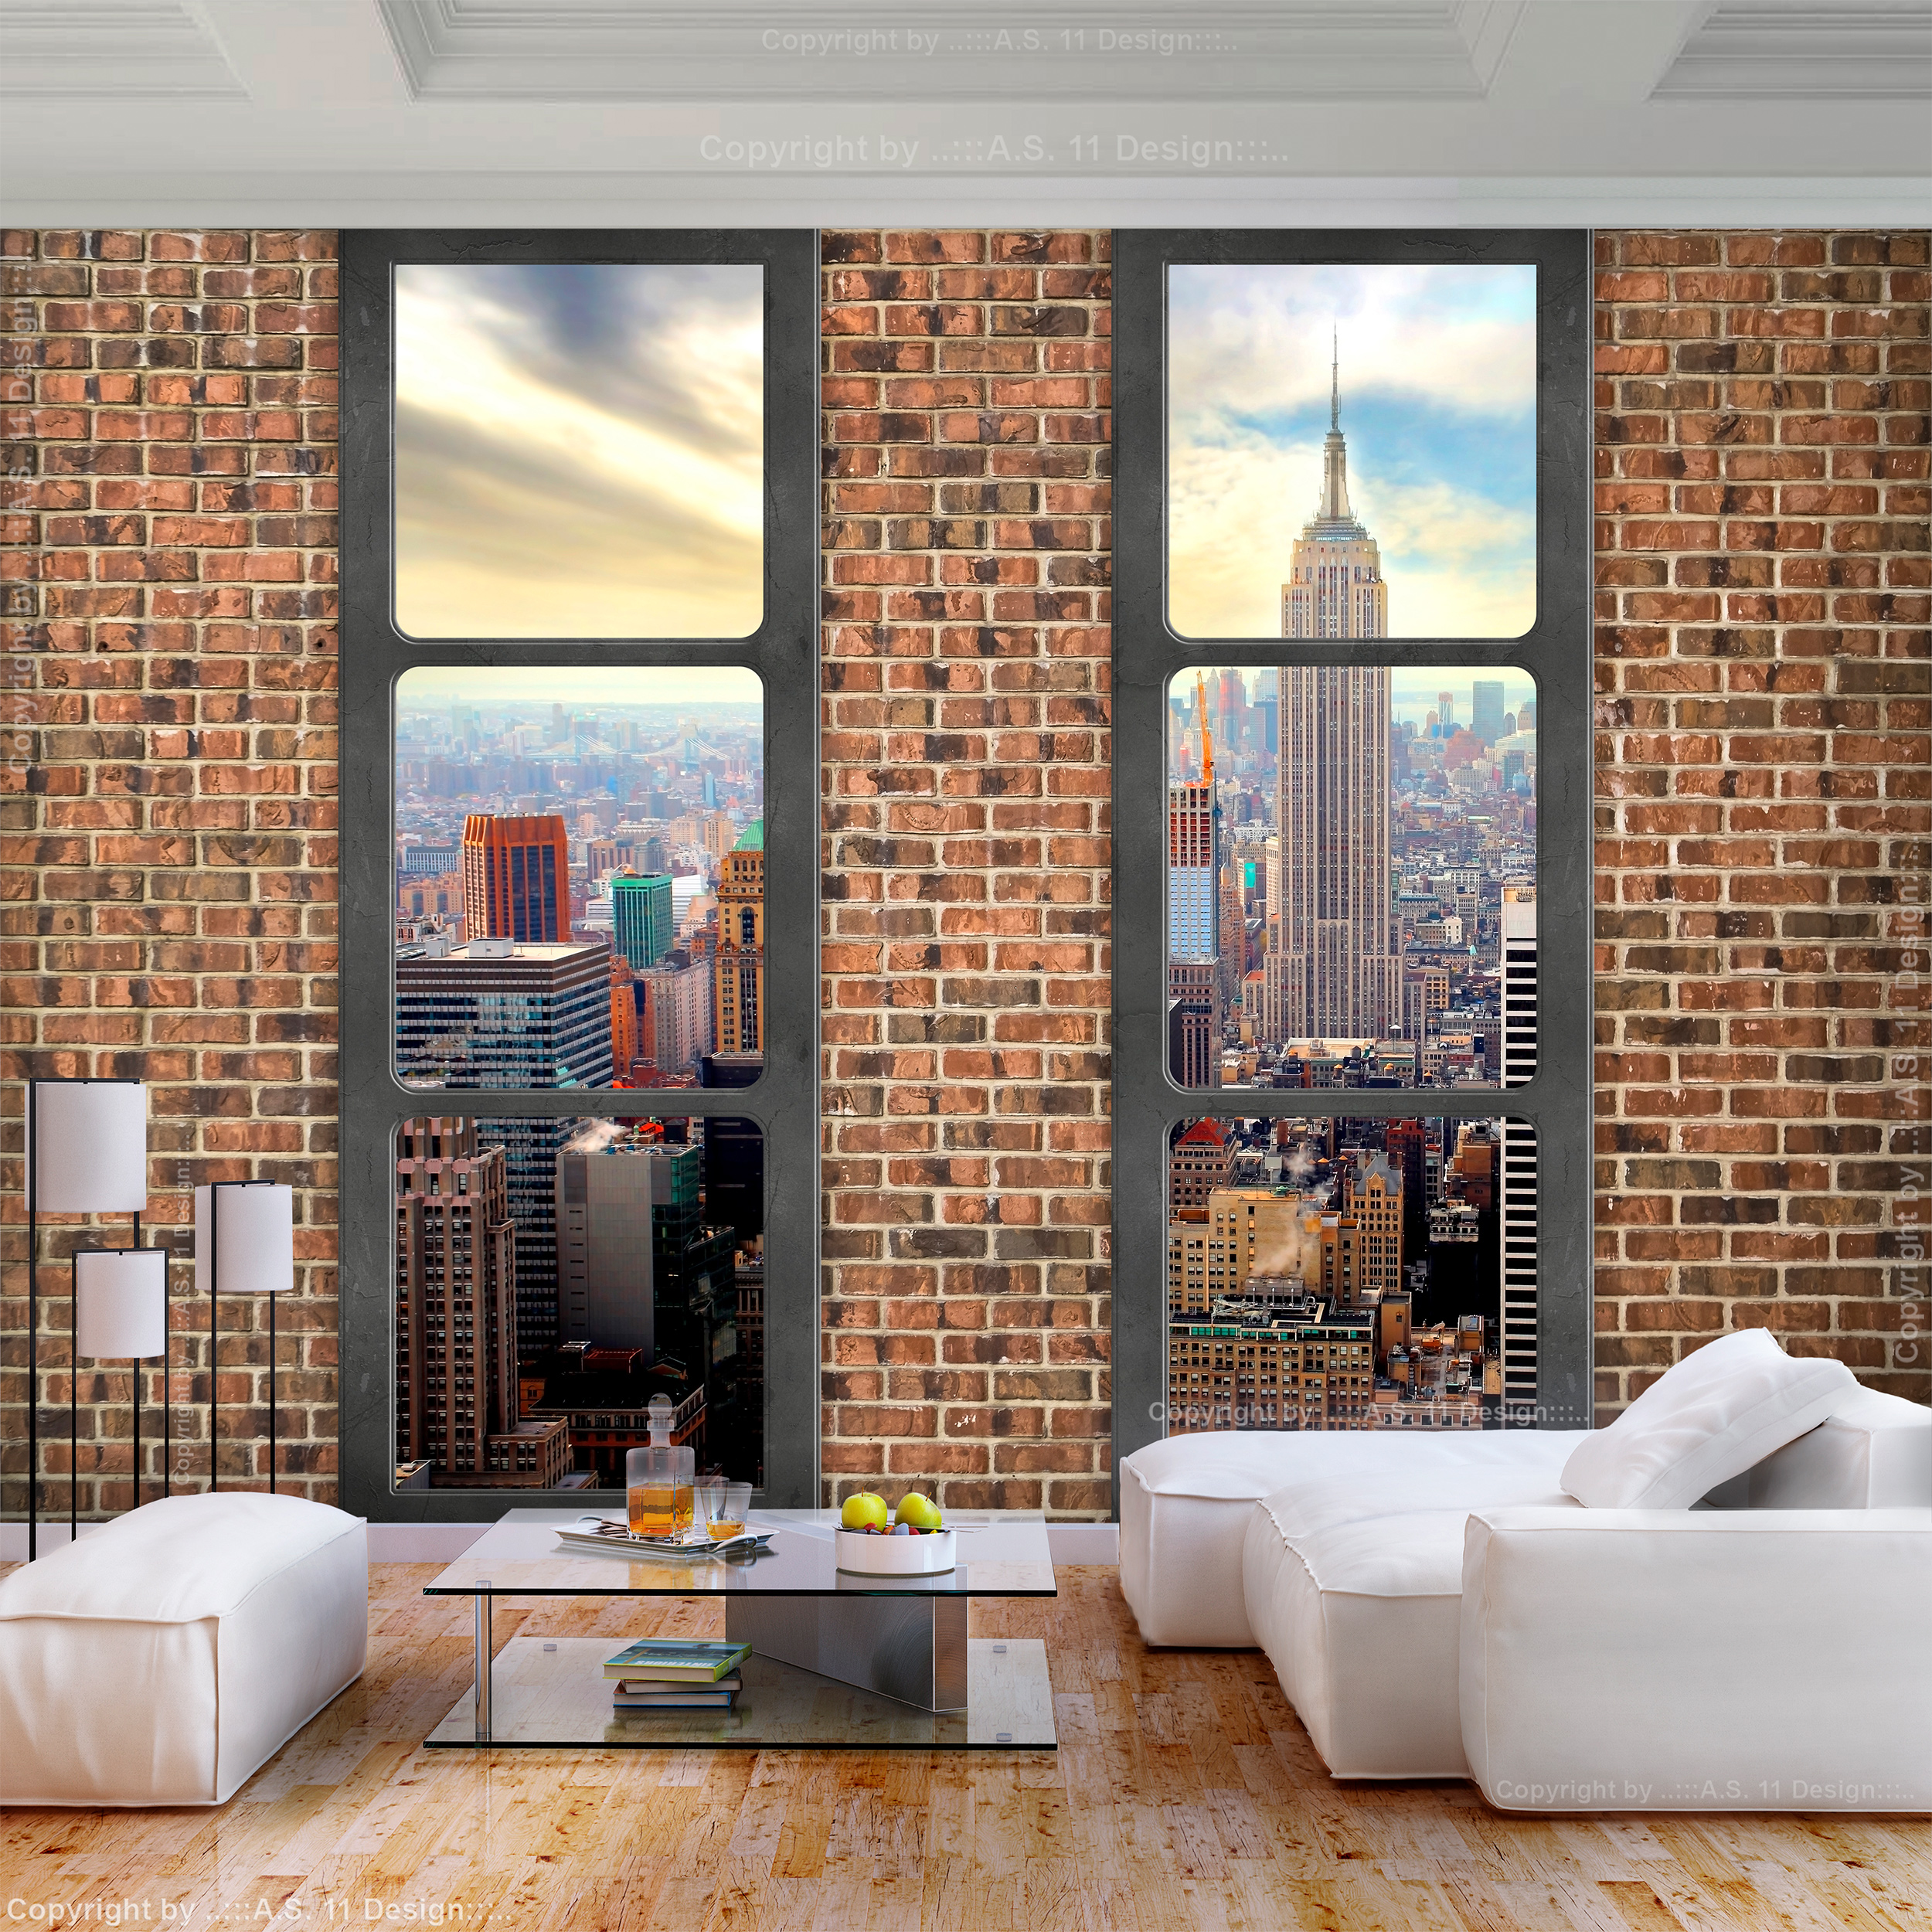 Vlies fototapete steinwand new york tapete wandbilder xxl wohnzimmer 3 farbe 053 ebay - Fototapete steinwand ...